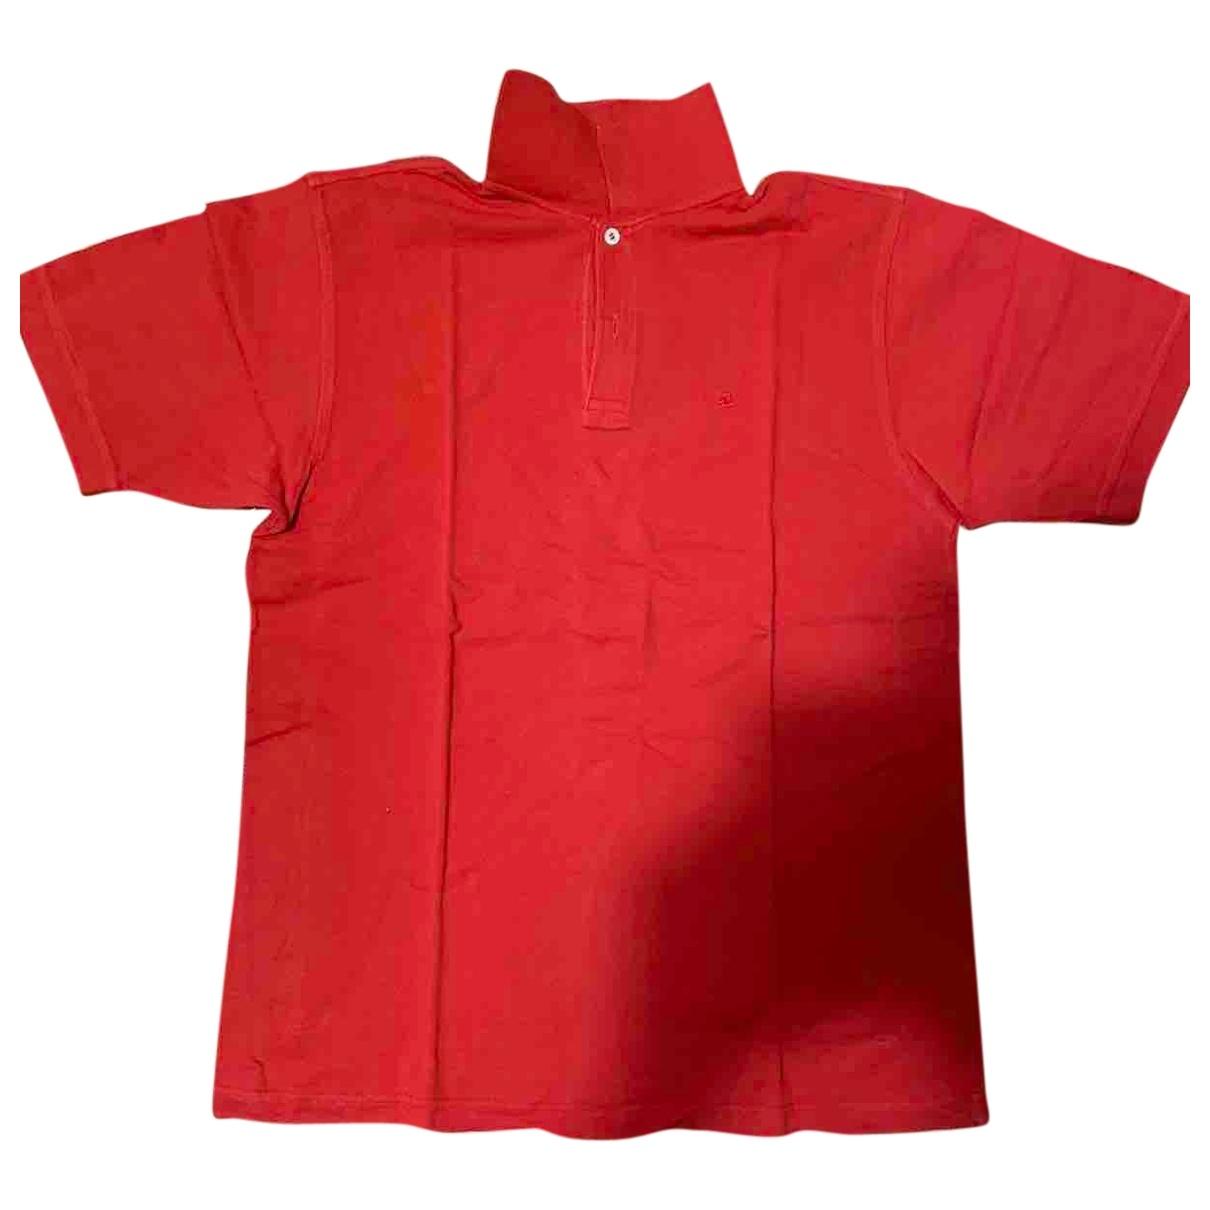 Polo en Algodon Rojo Invicta